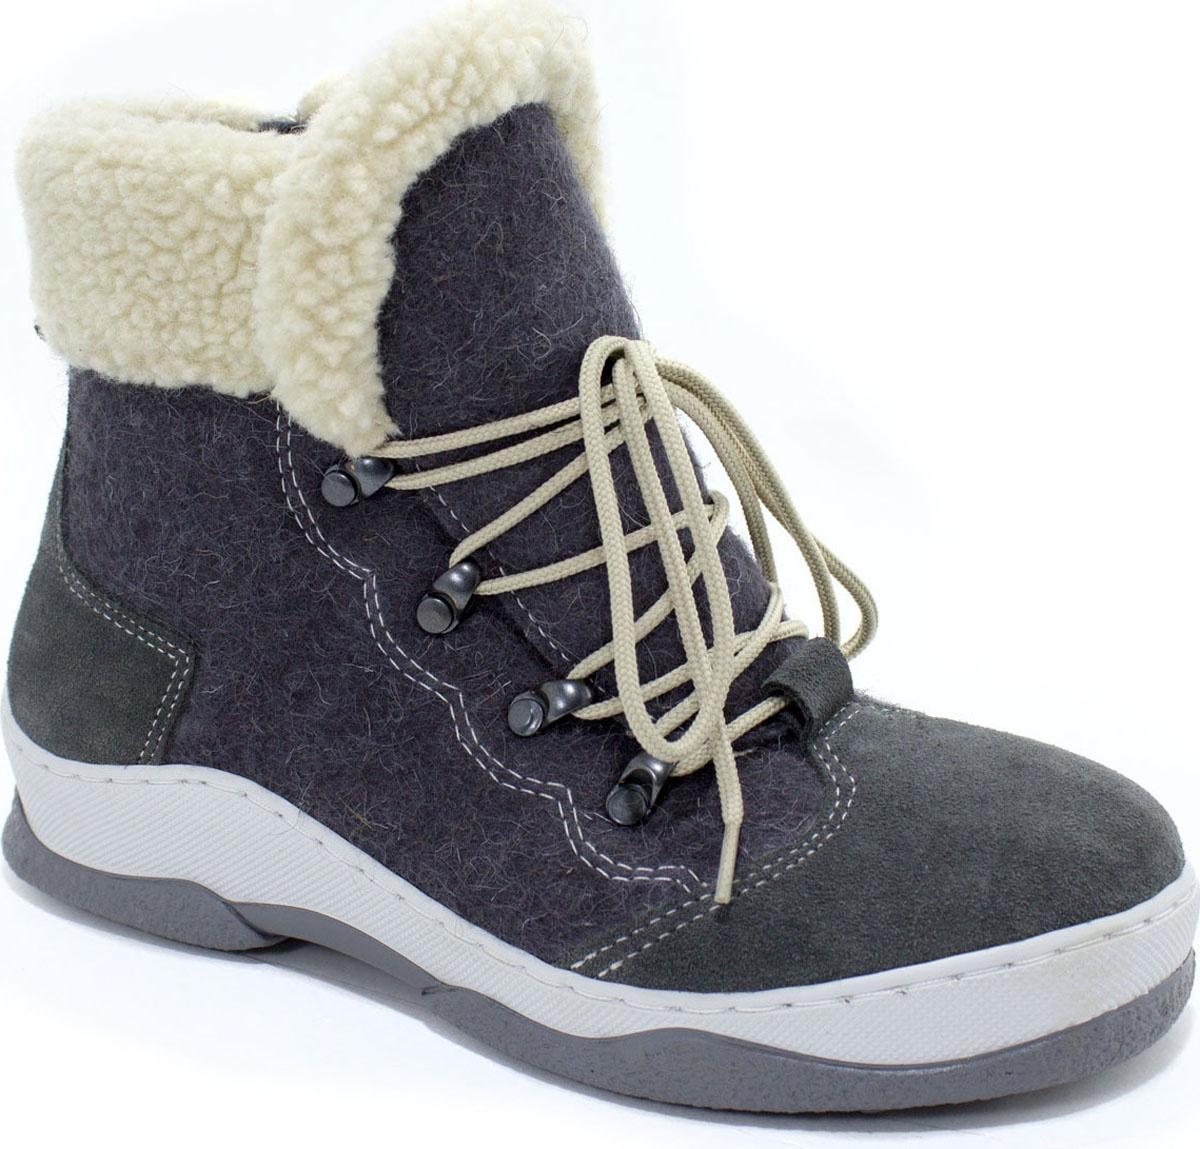 Ботинки Кукморские валенки #1